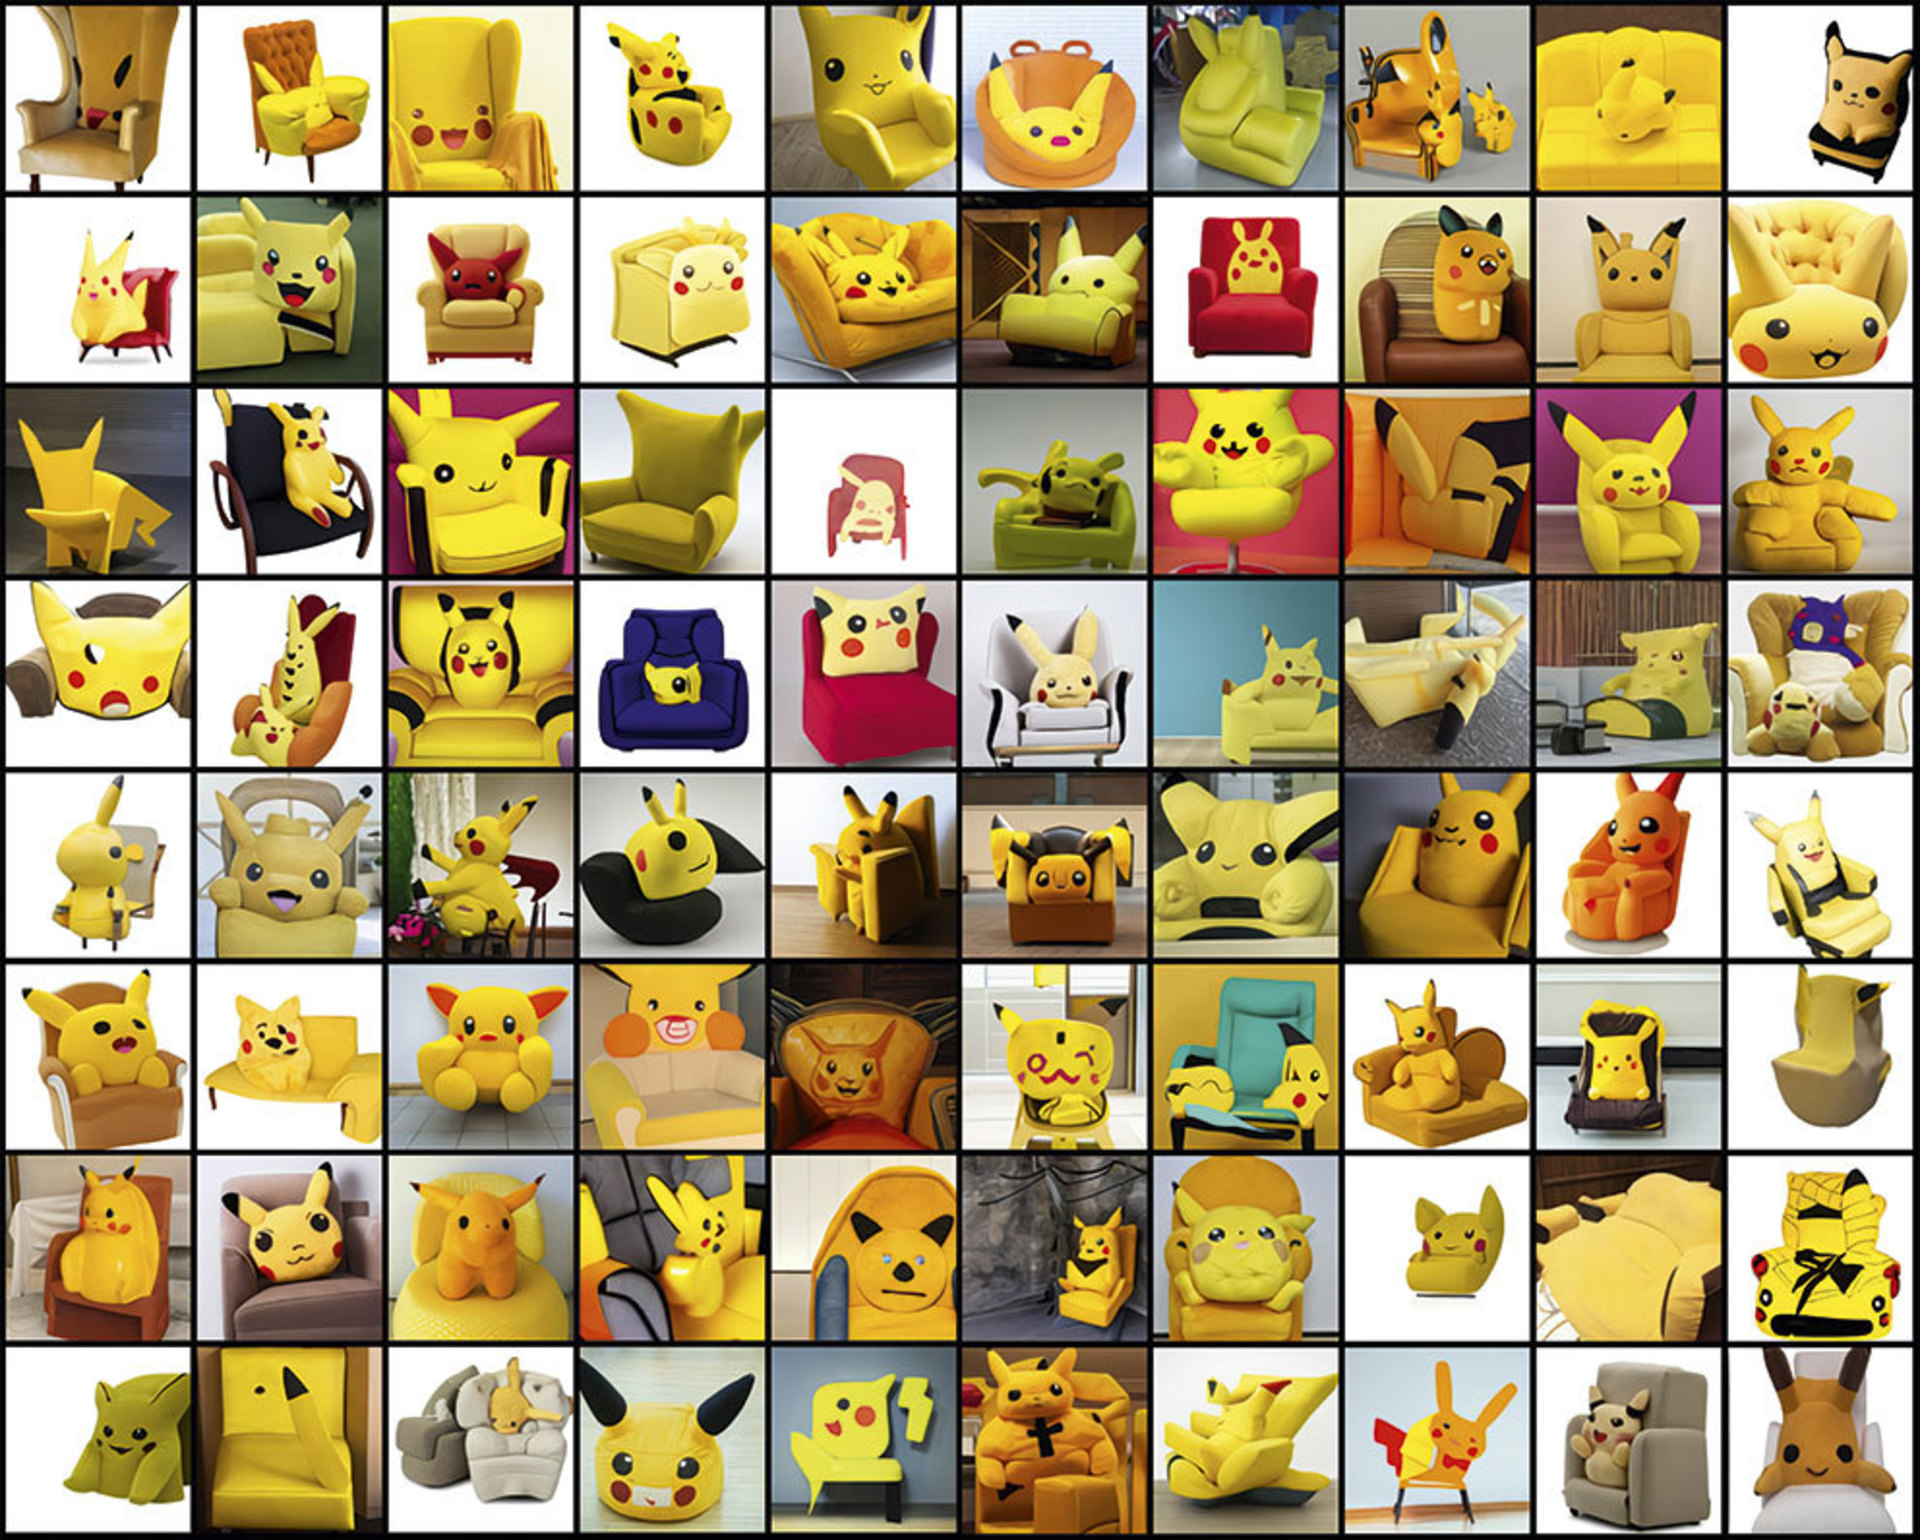 dall-e-pikachu.jpg